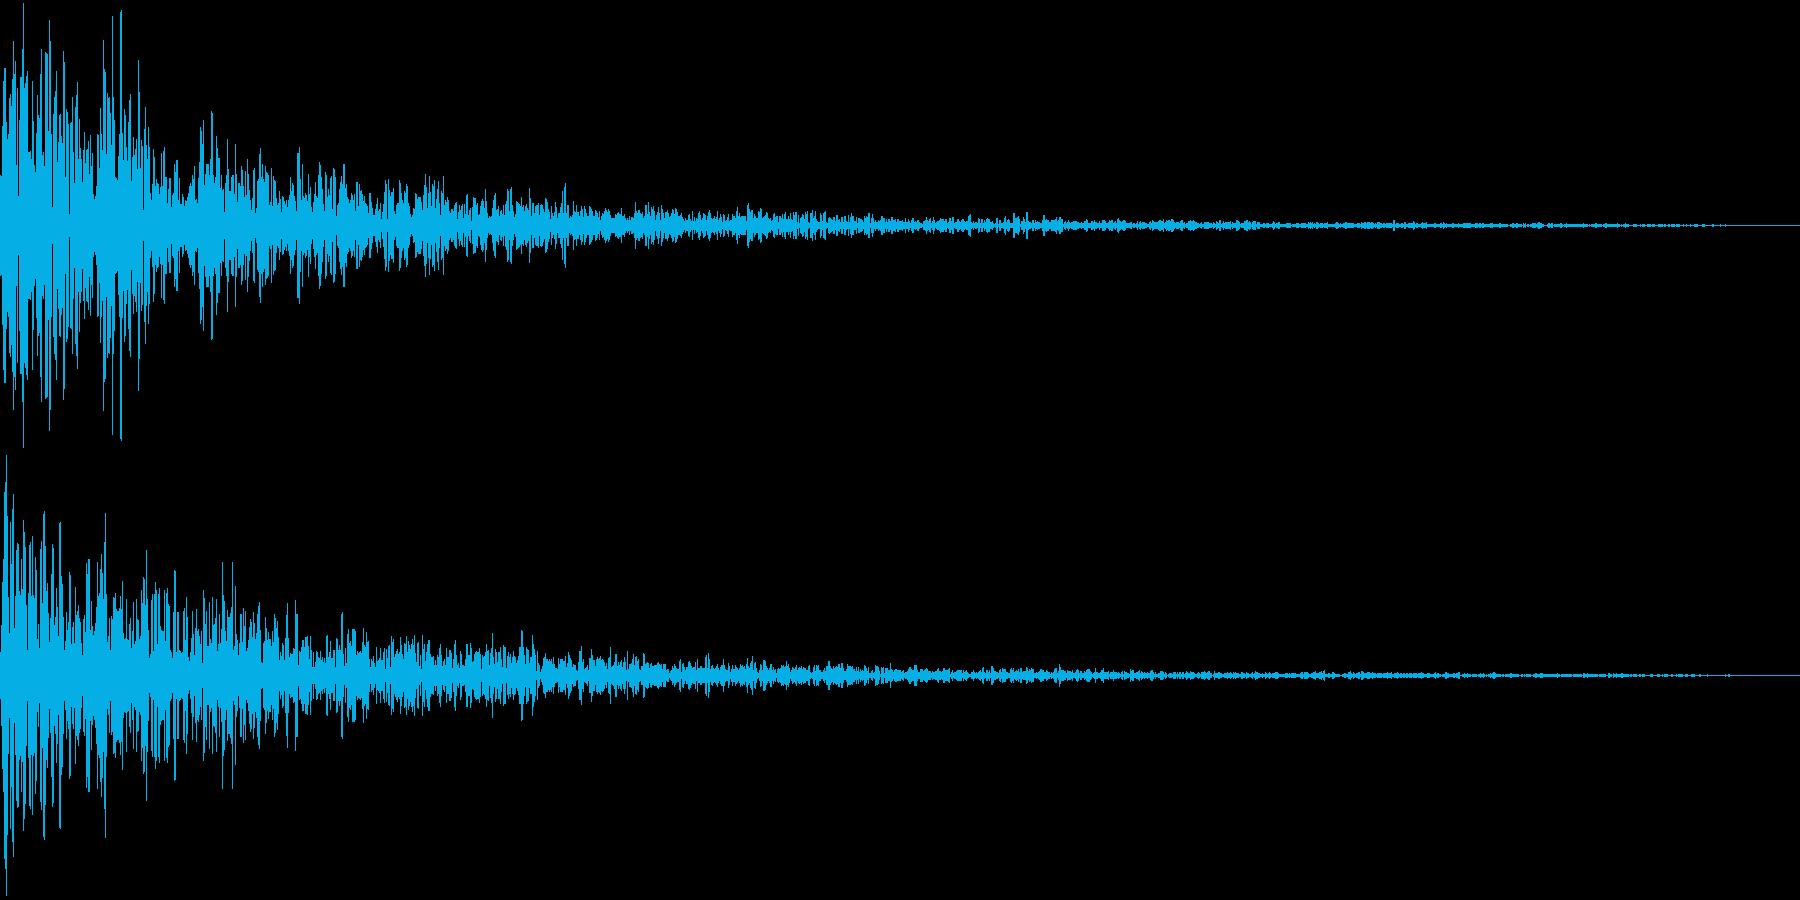 TVFX ホラーな単音SE 恐怖 戦慄の再生済みの波形